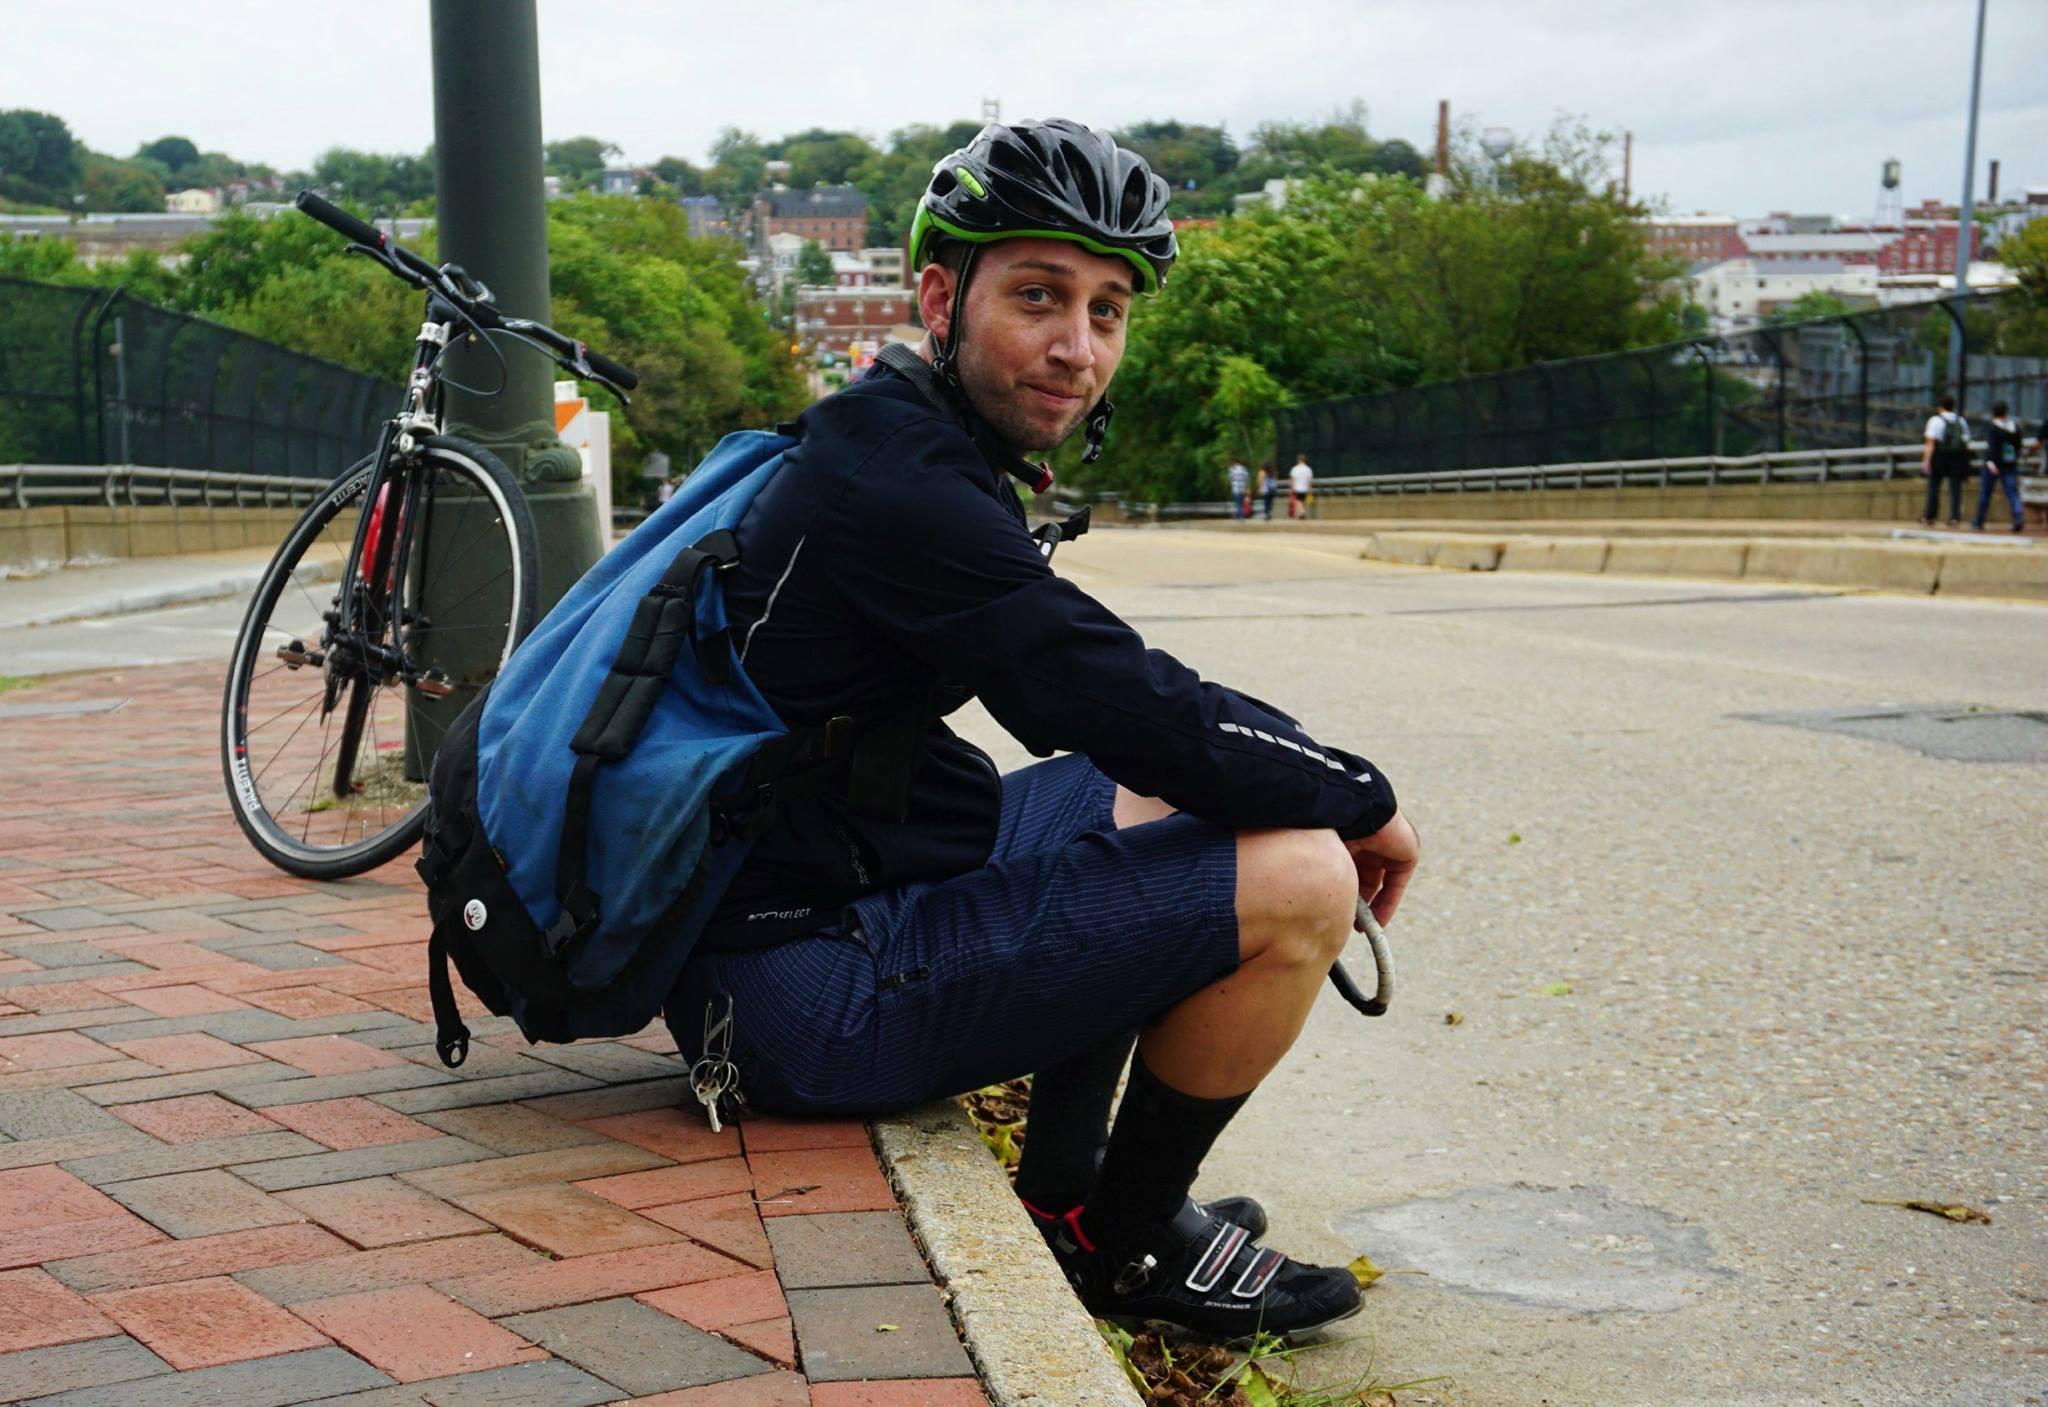 2015 World Road Cycling Champs Richmond, VA